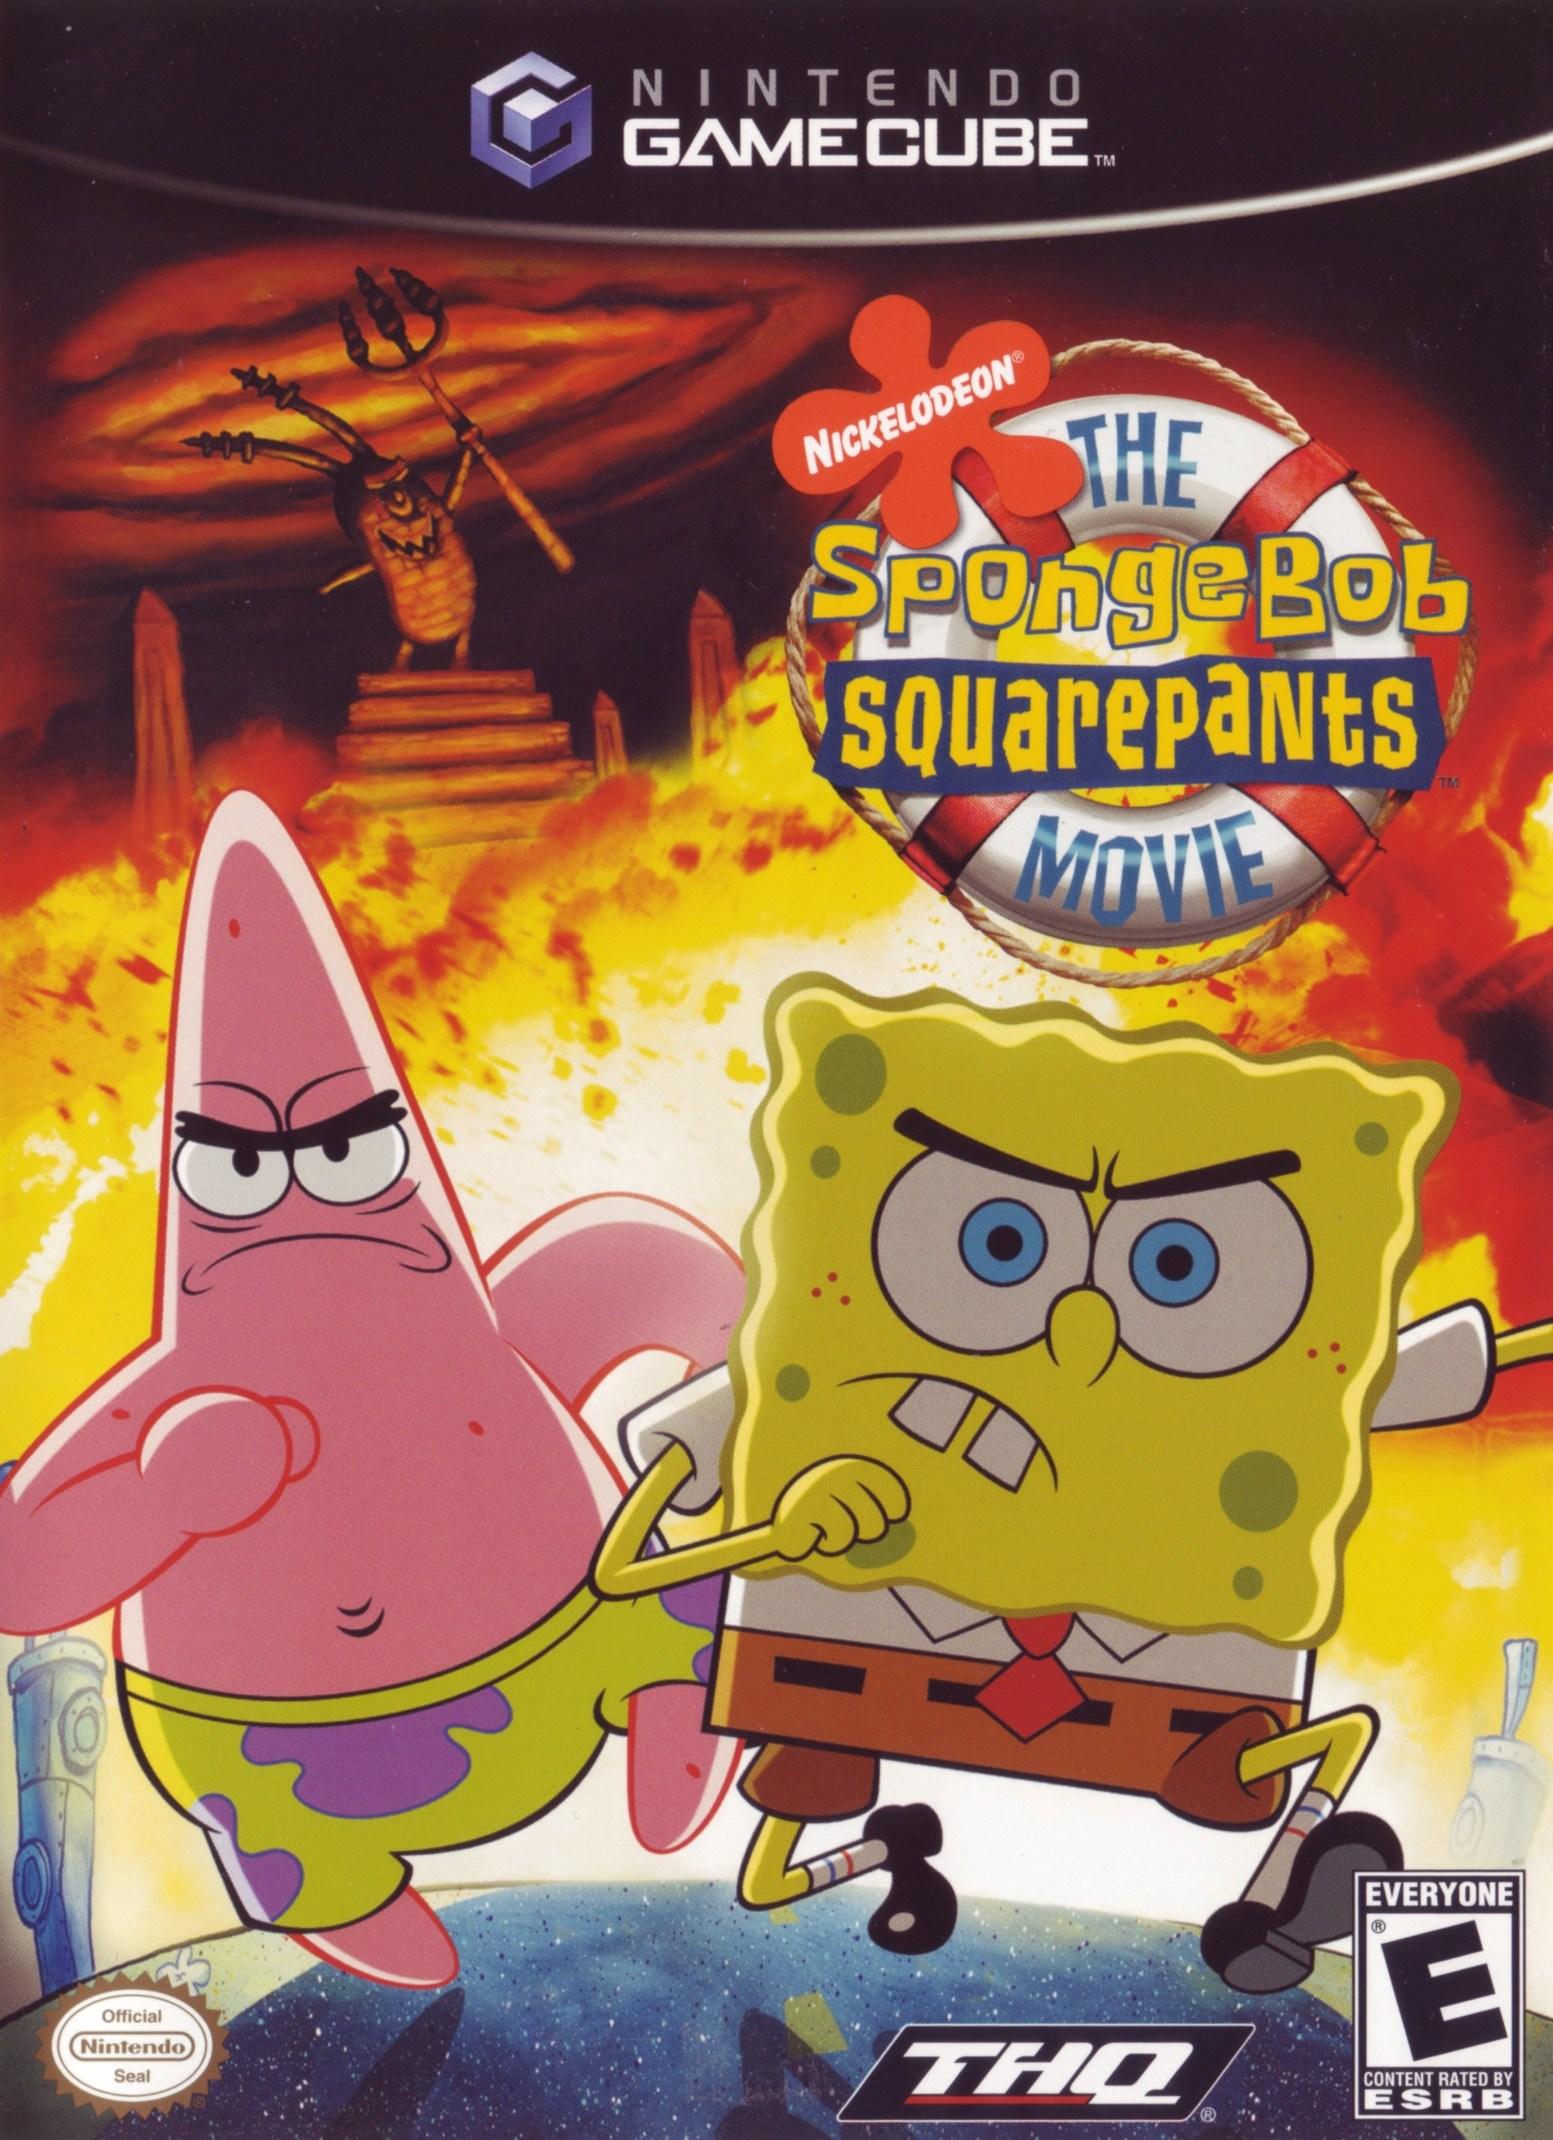 Spongebob Squarepants Movie Video Game Soundtrack MP3